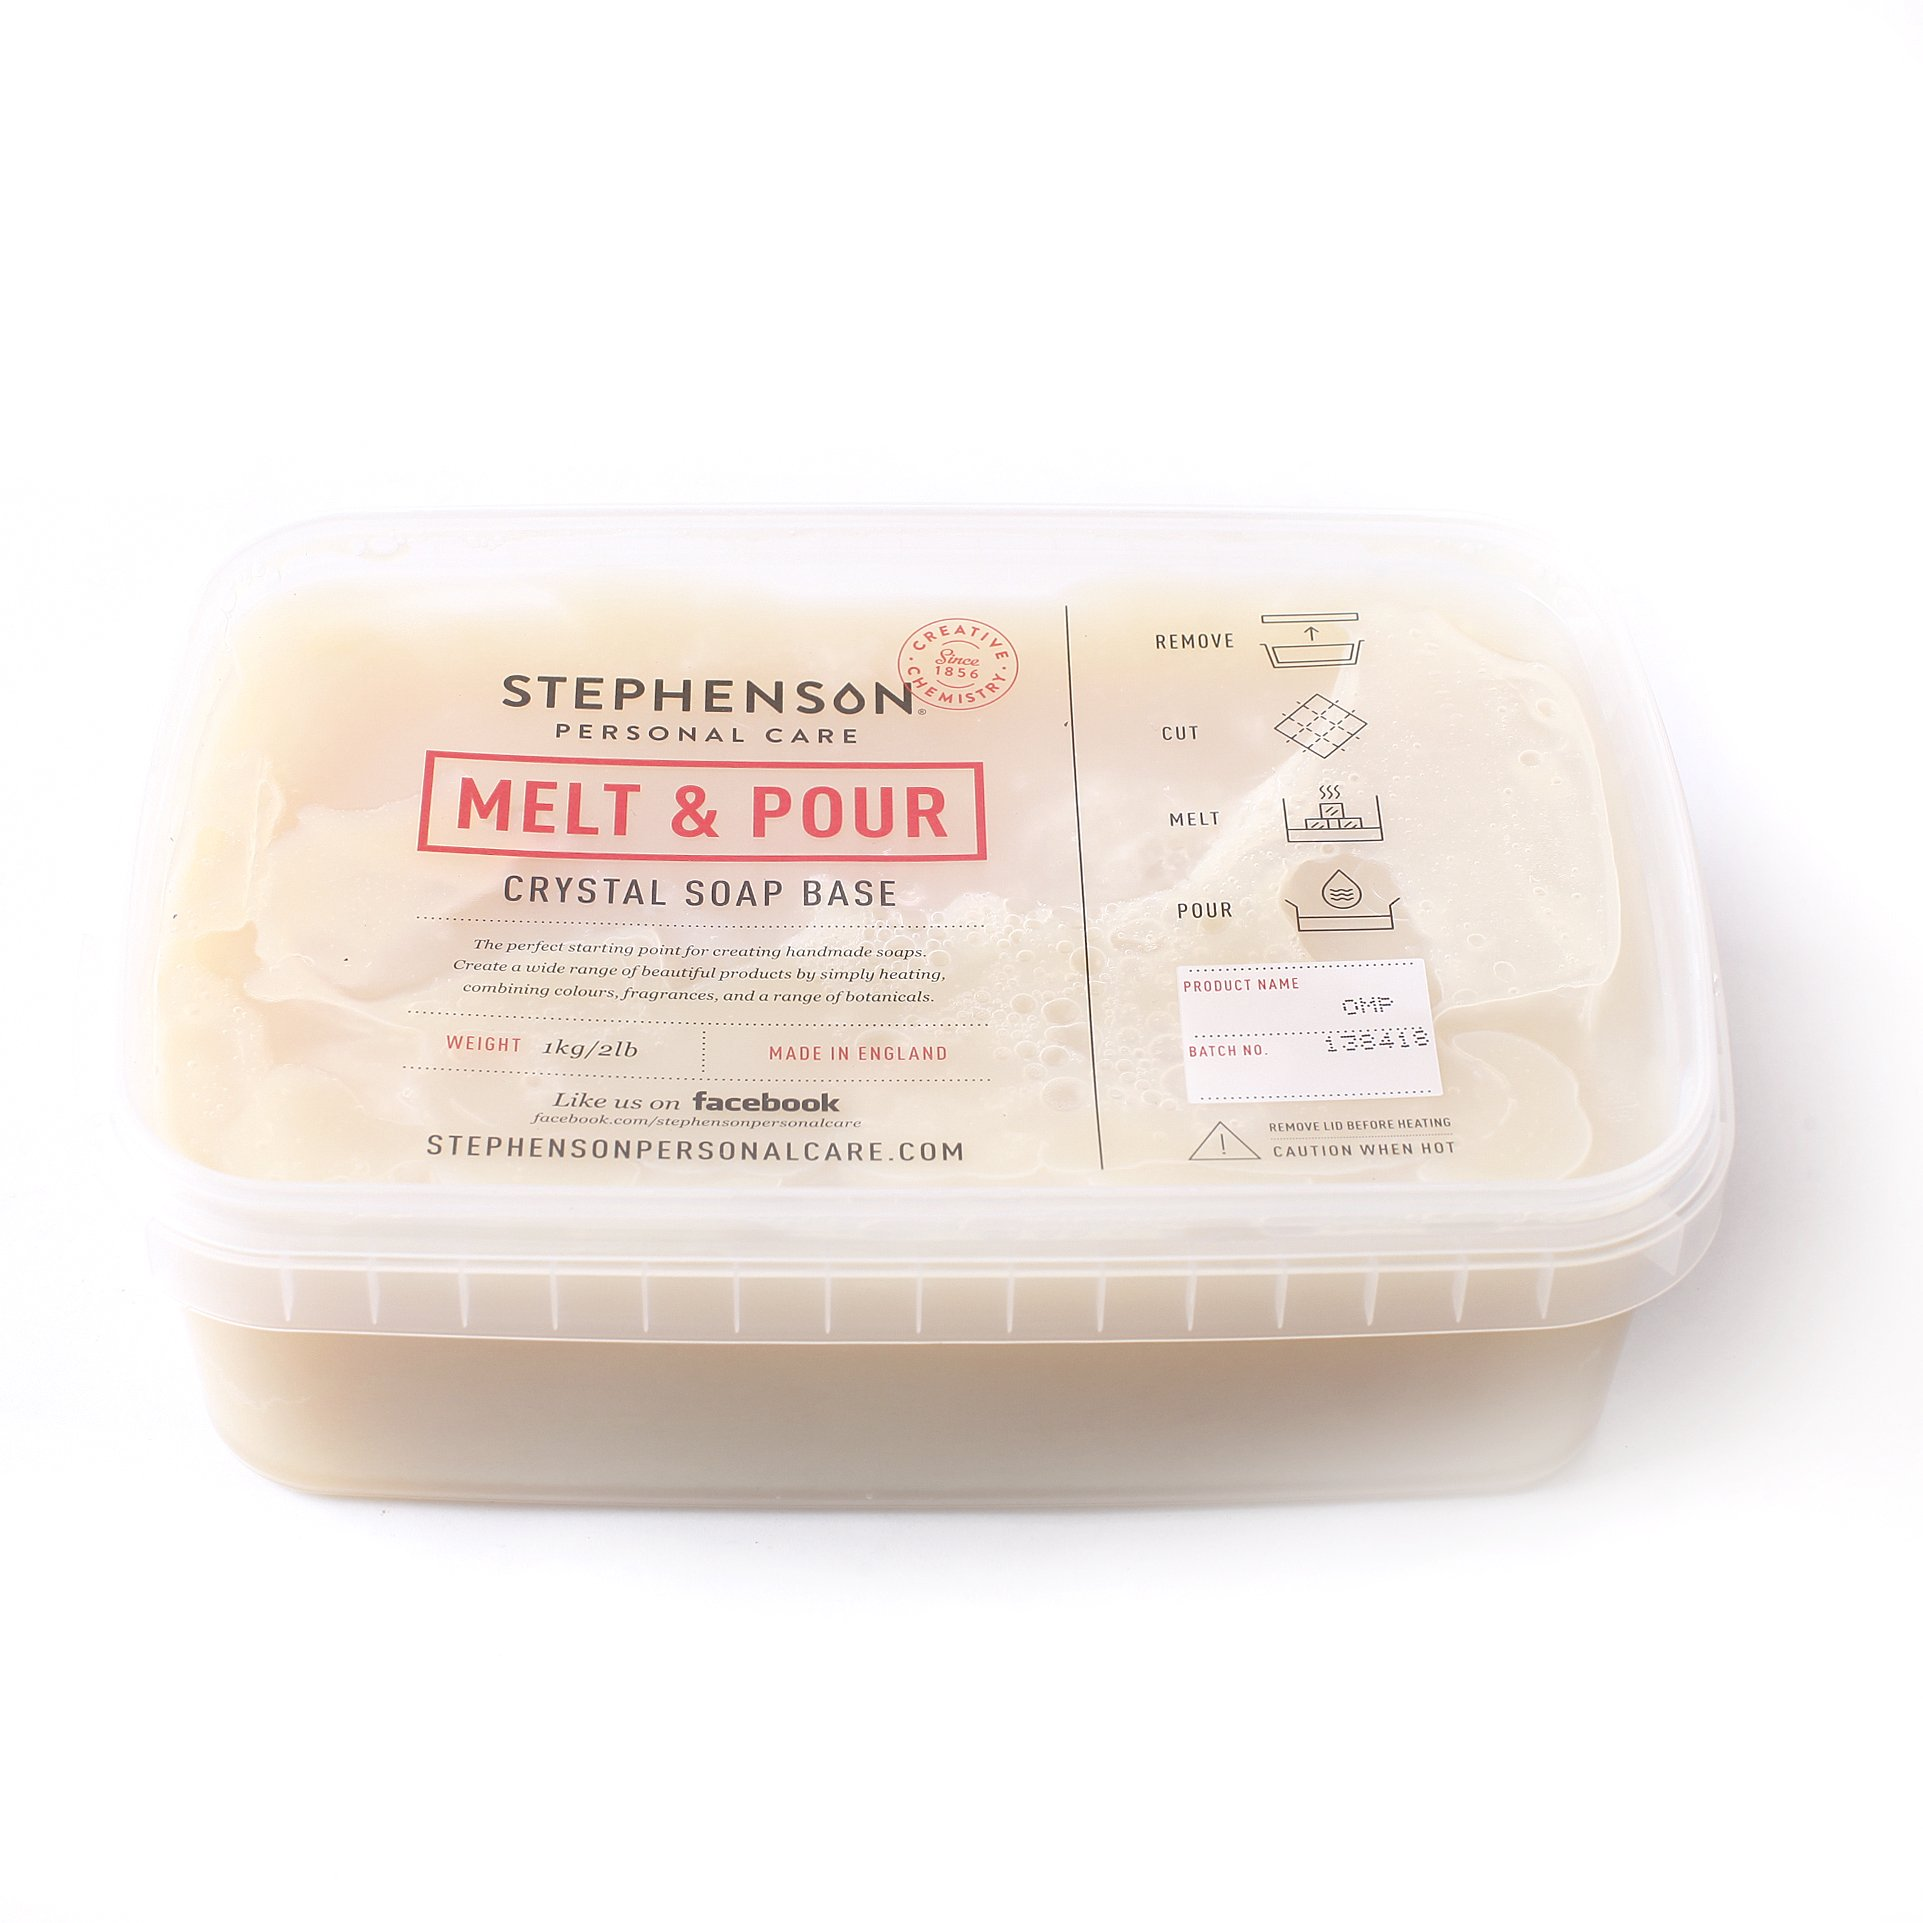 │ Bulk Premium 100/% Natural Glycerin Soap Base │ Luxurious Soap Making Supplies Pifito Castile Melt and Pour Soap Base 5 lb